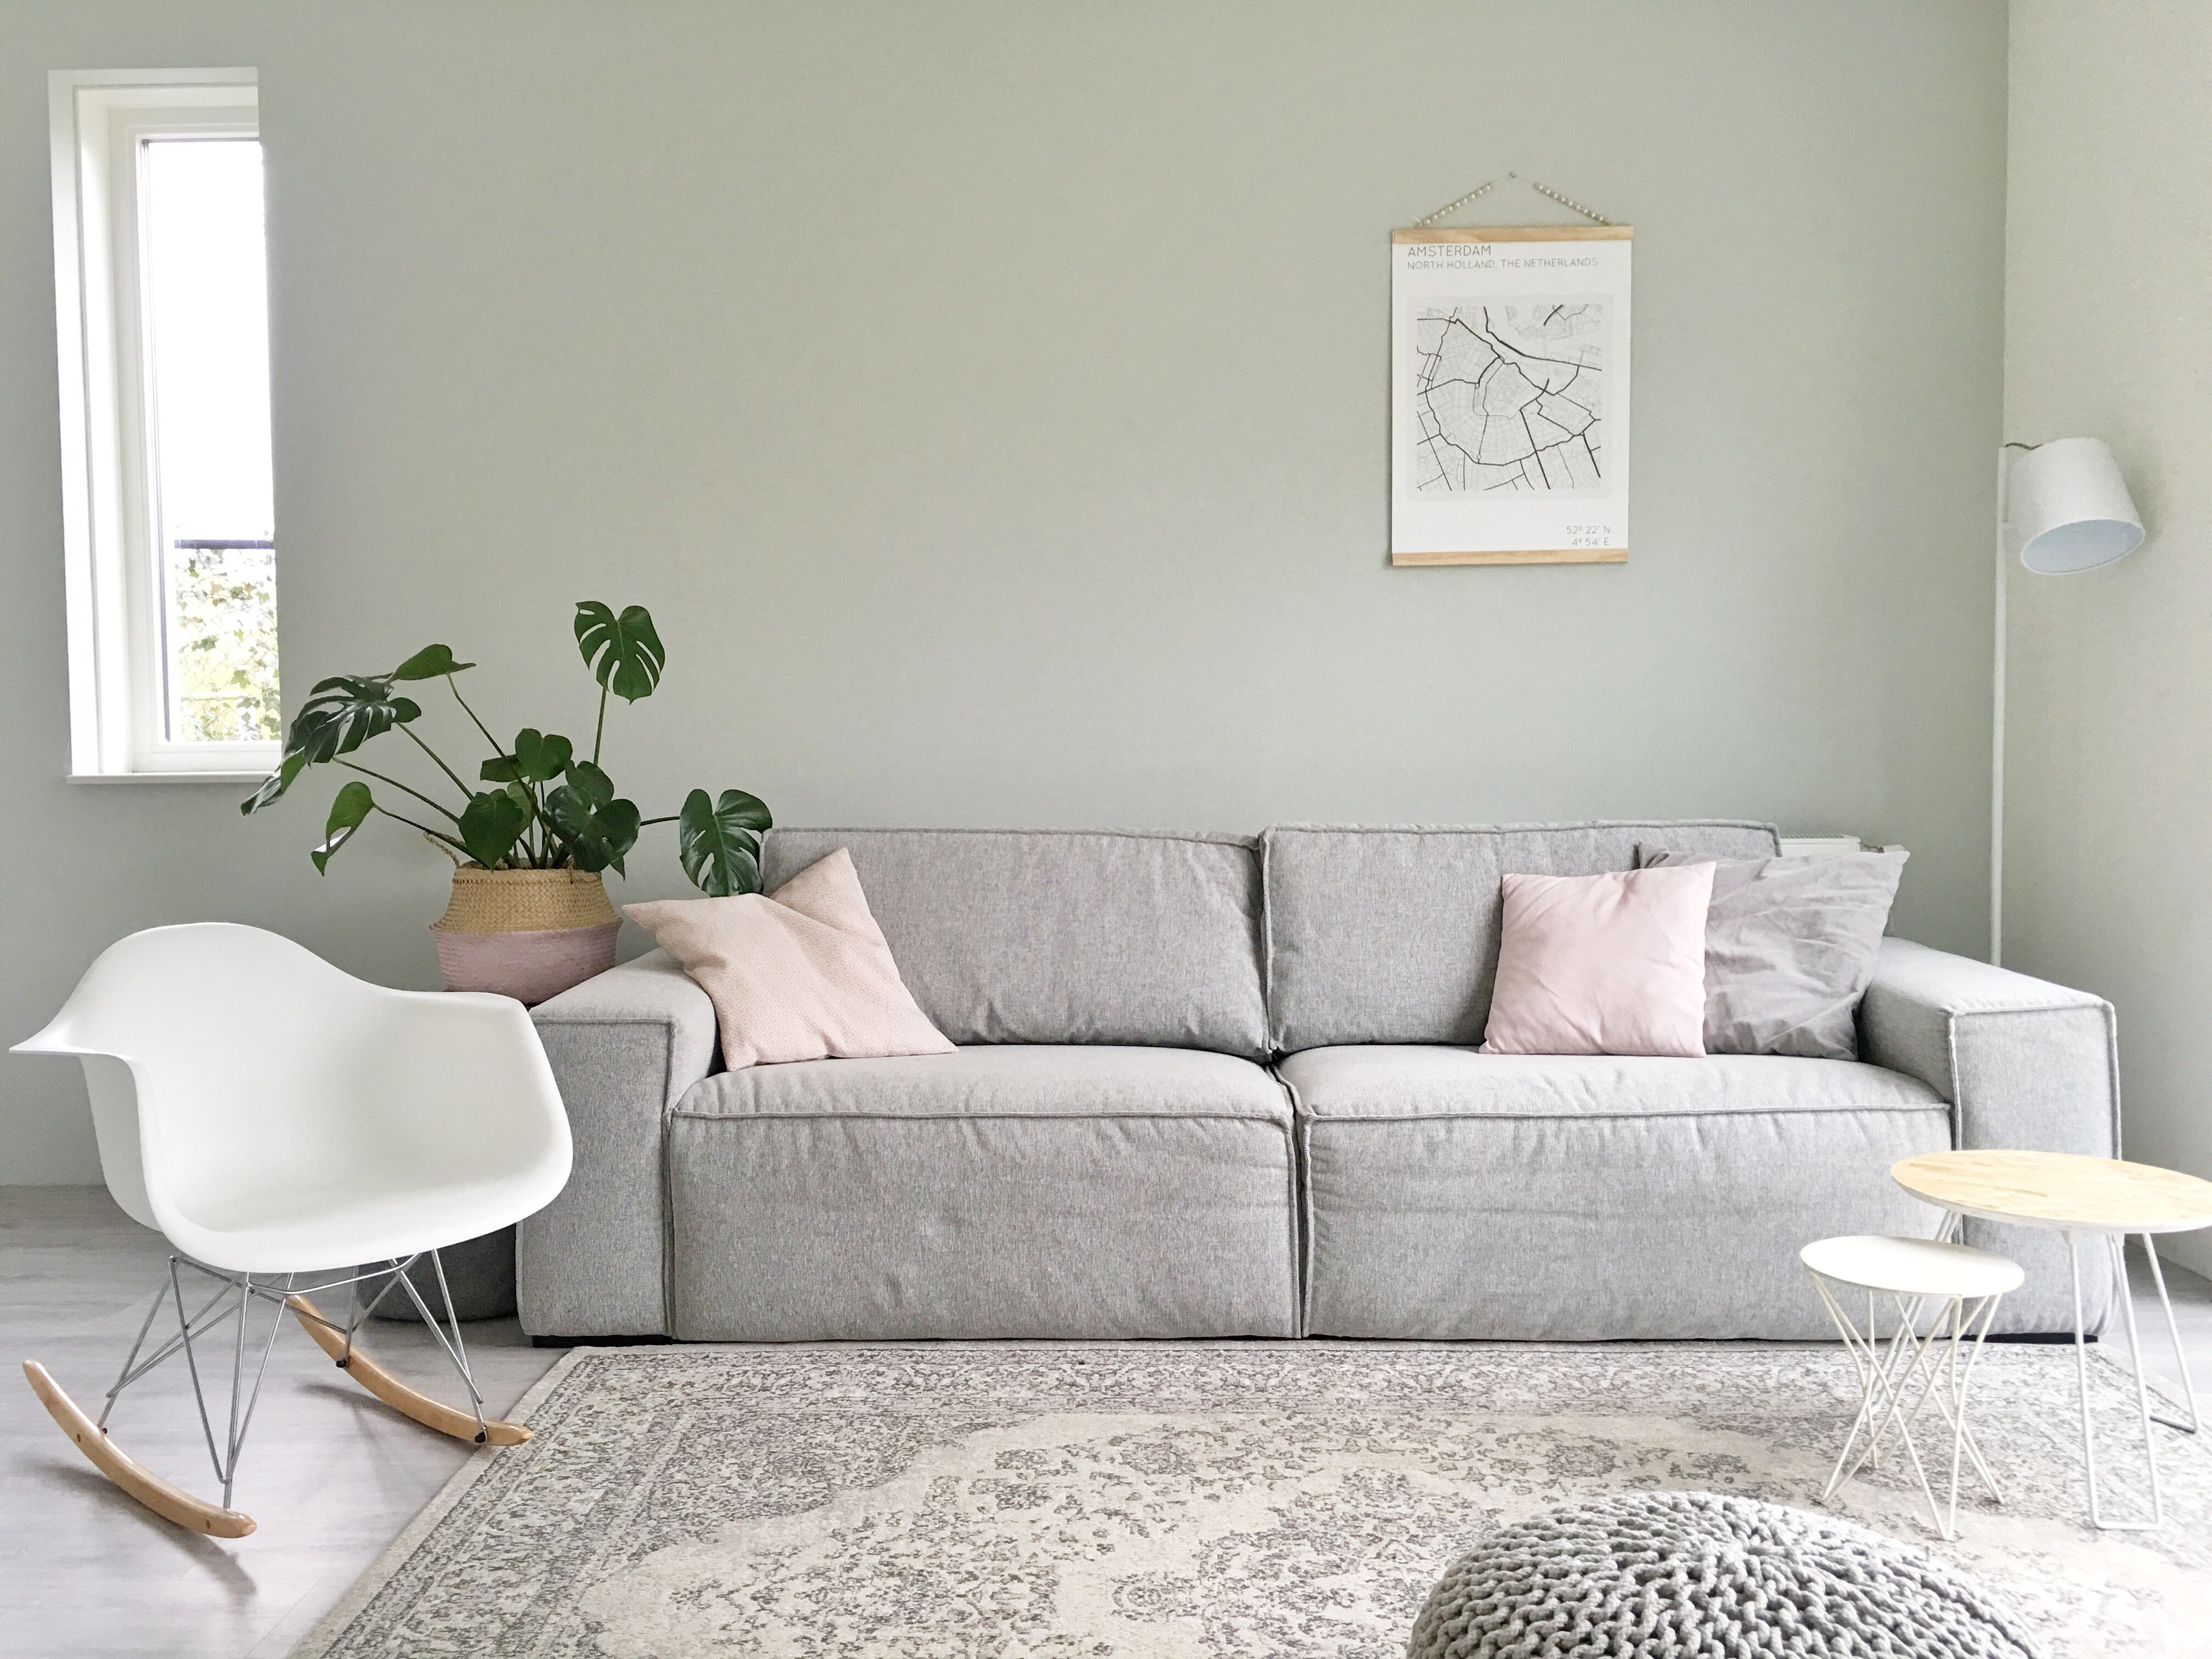 Afbeeldingsresultaat voor muurverf groen | Woonkamer | Pinterest ...